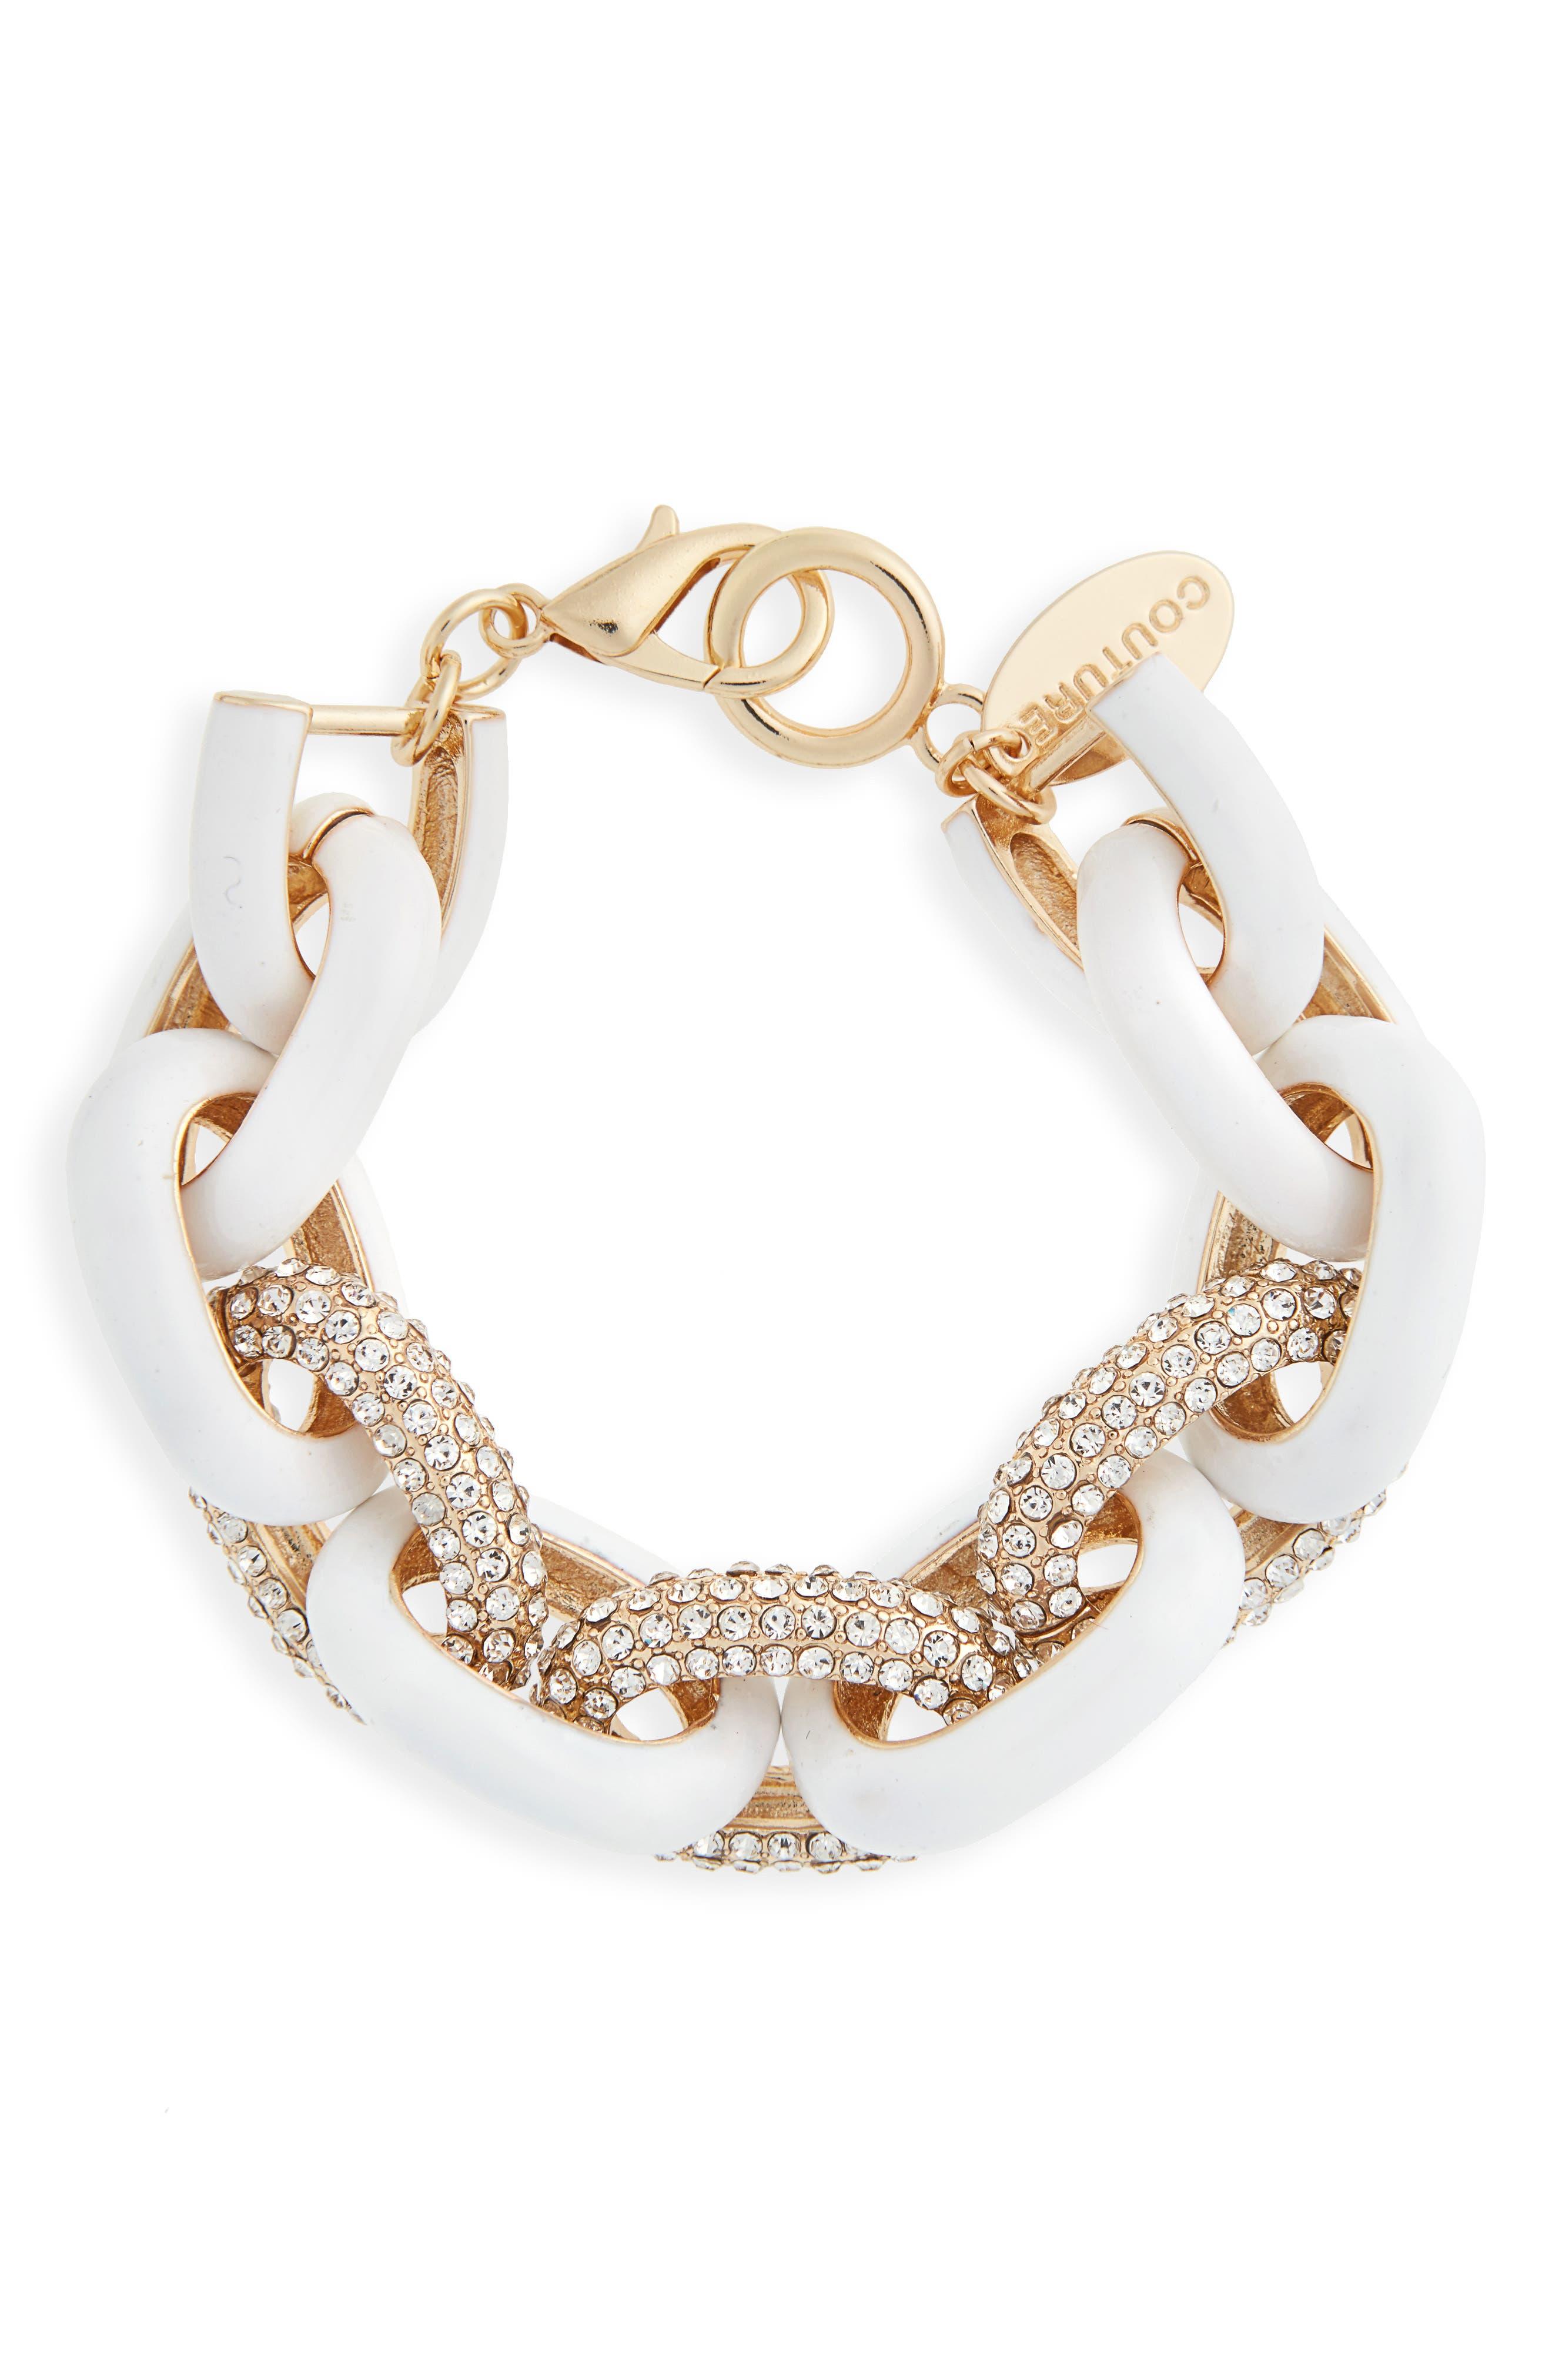 Main Image - Natasha Couture Crystal Link Bracelet